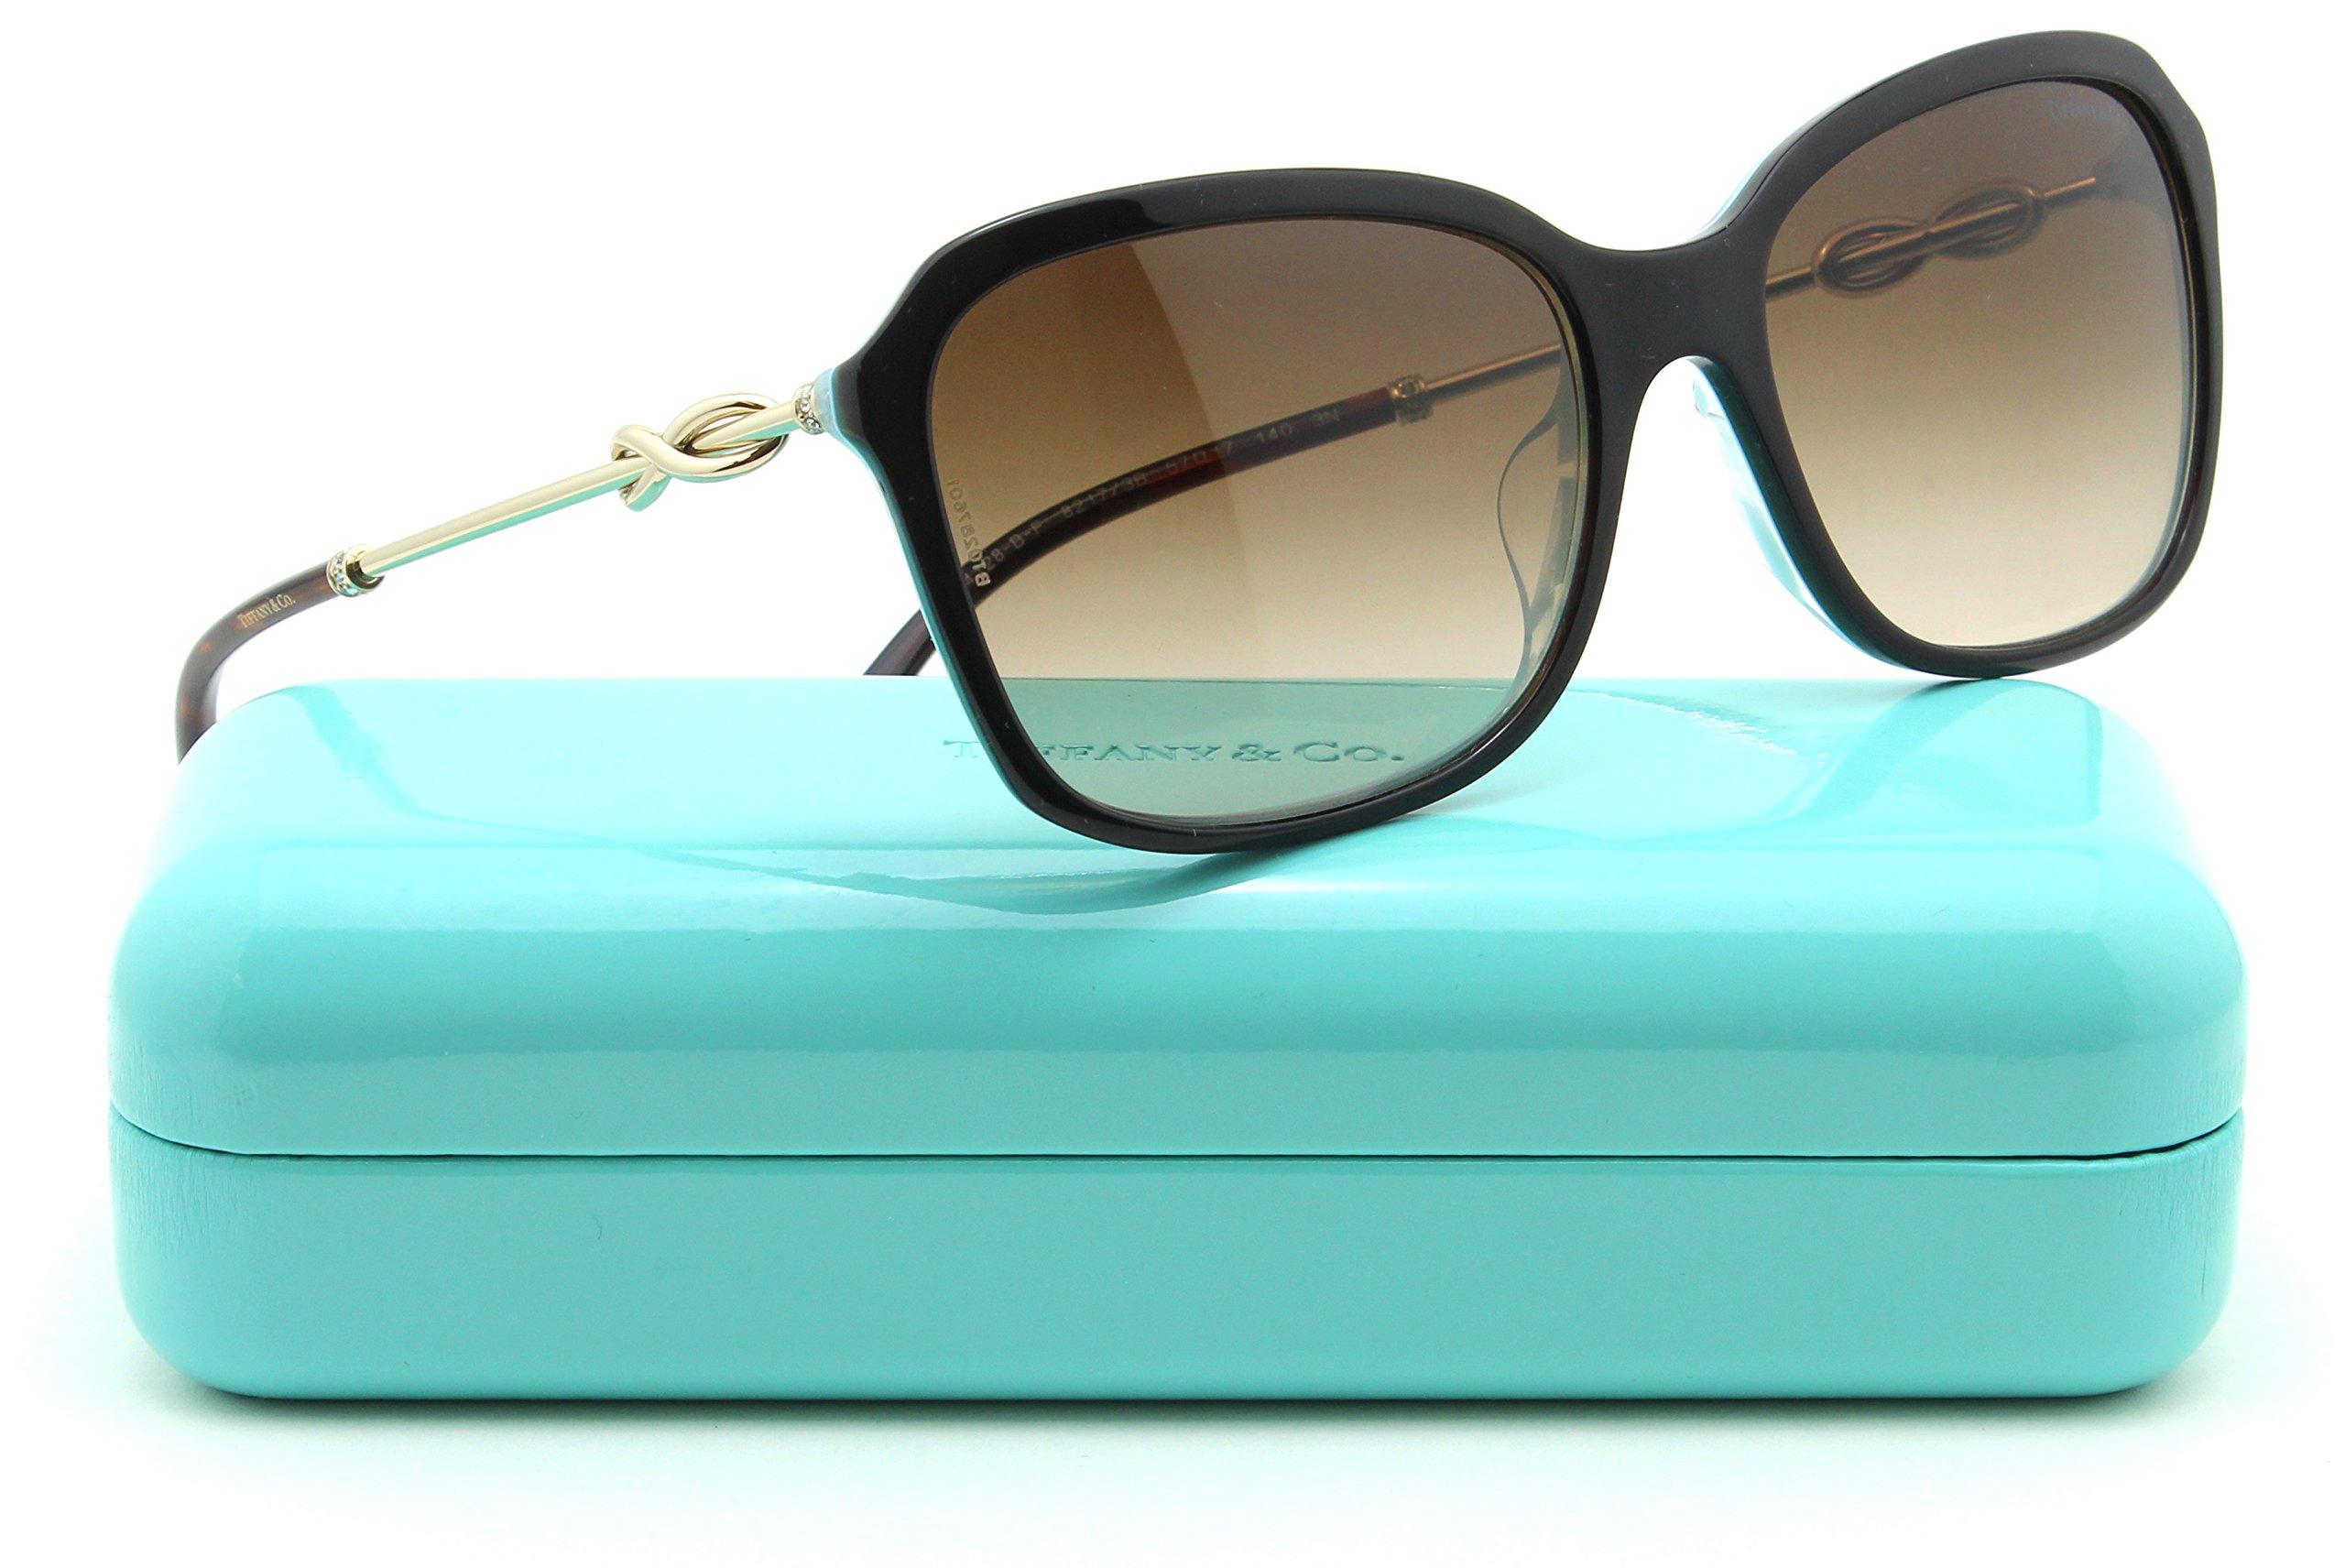 Tiffany & Co. TF 4128-BF Womens Gradient Sunglasses Asian Fit 82173B